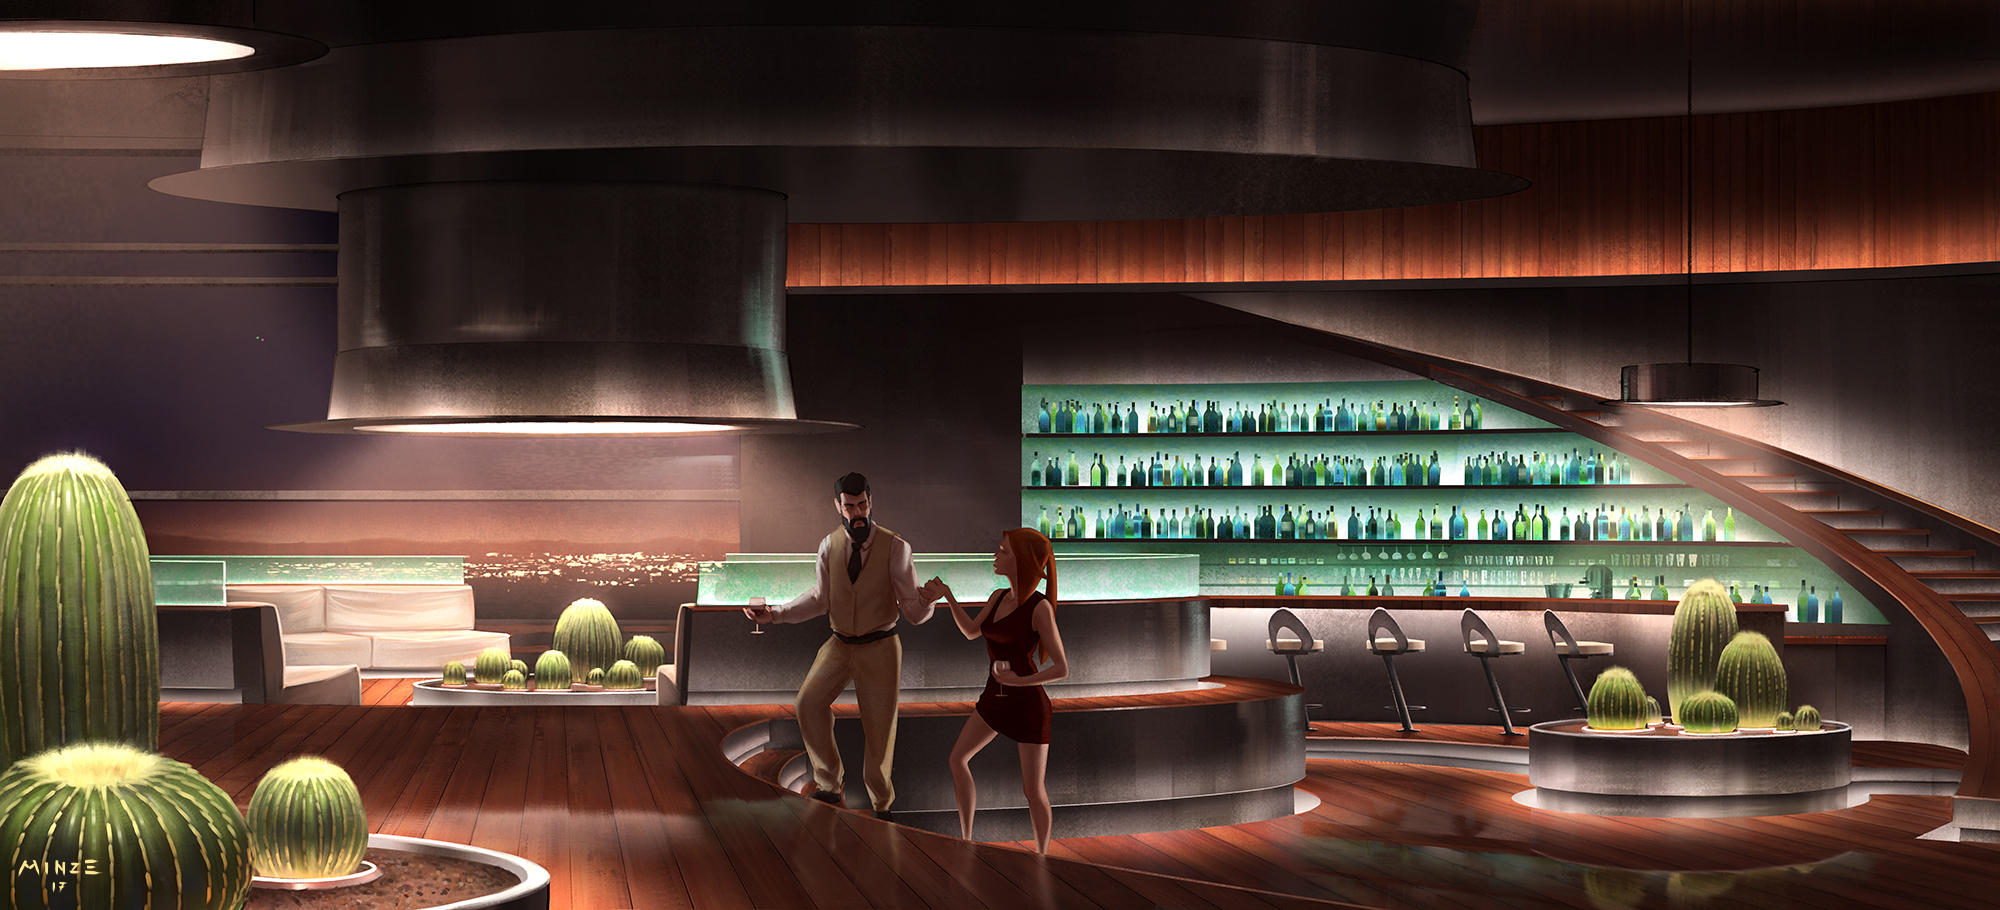 Private bar by ATArts